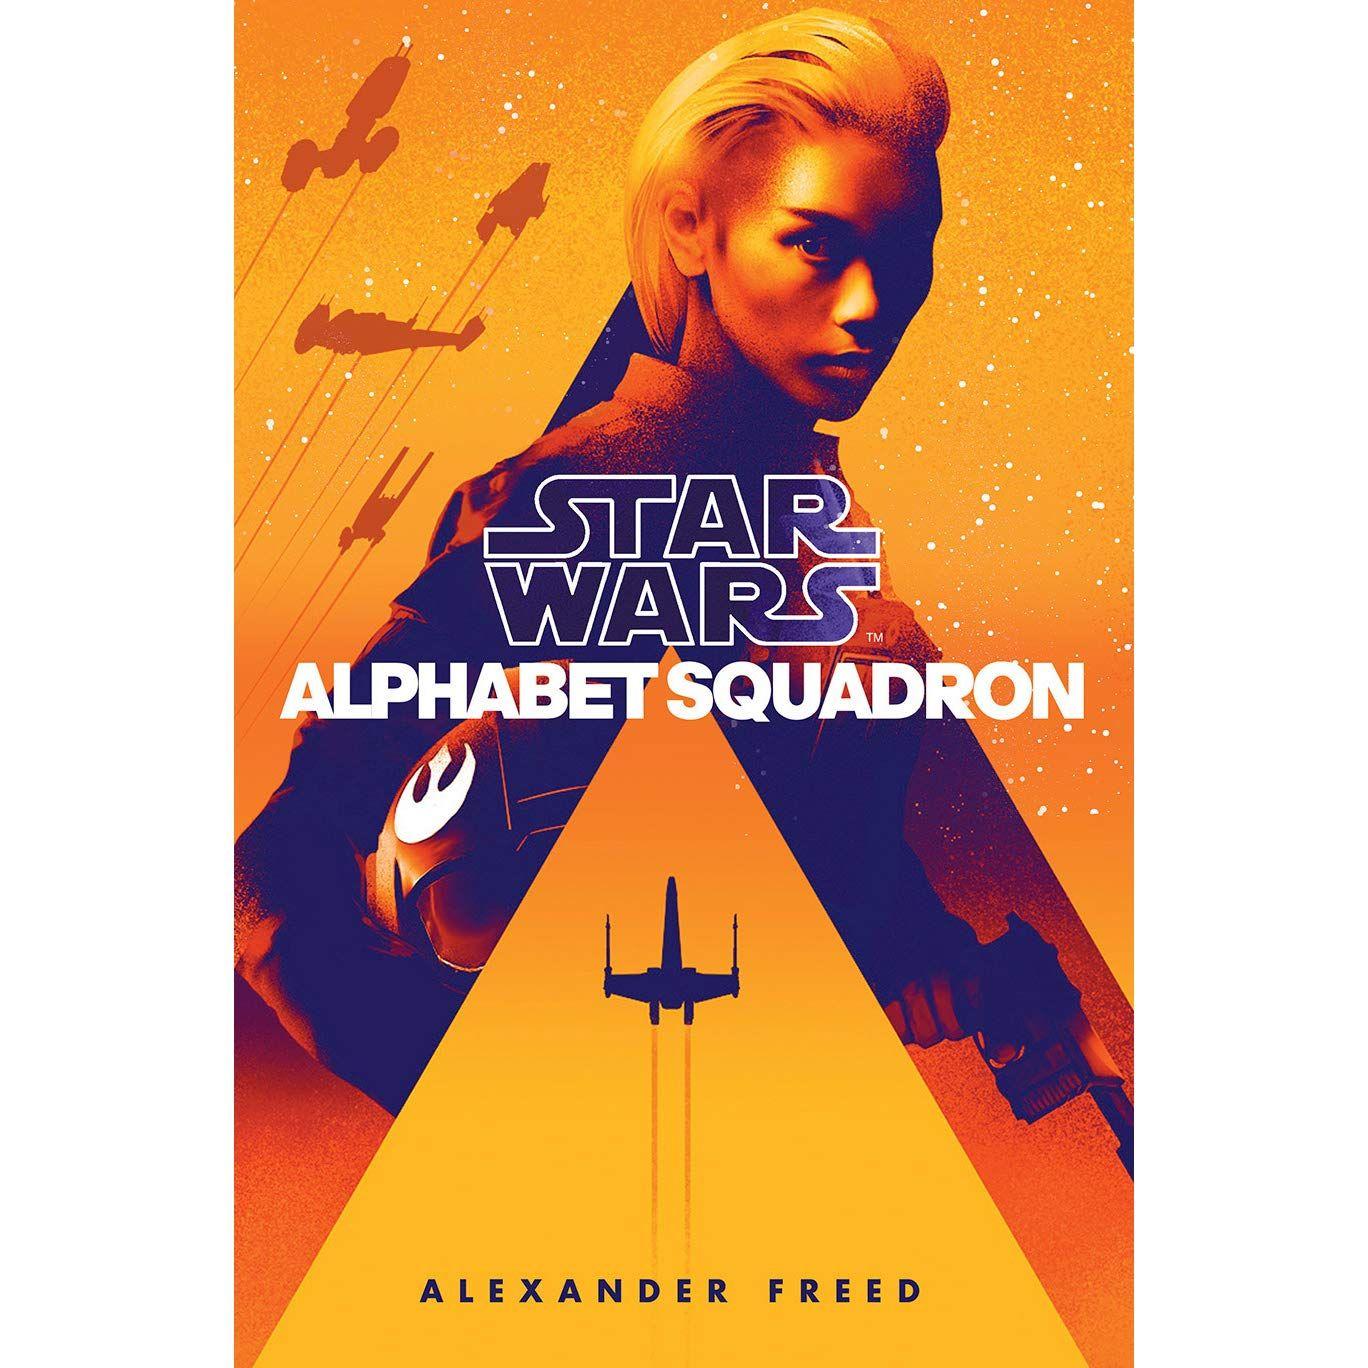 Alphabet Squadron Star Wars By Alexander Freed Audiobook Mp3 Star Wars Books Star Wars Star Wars Novels